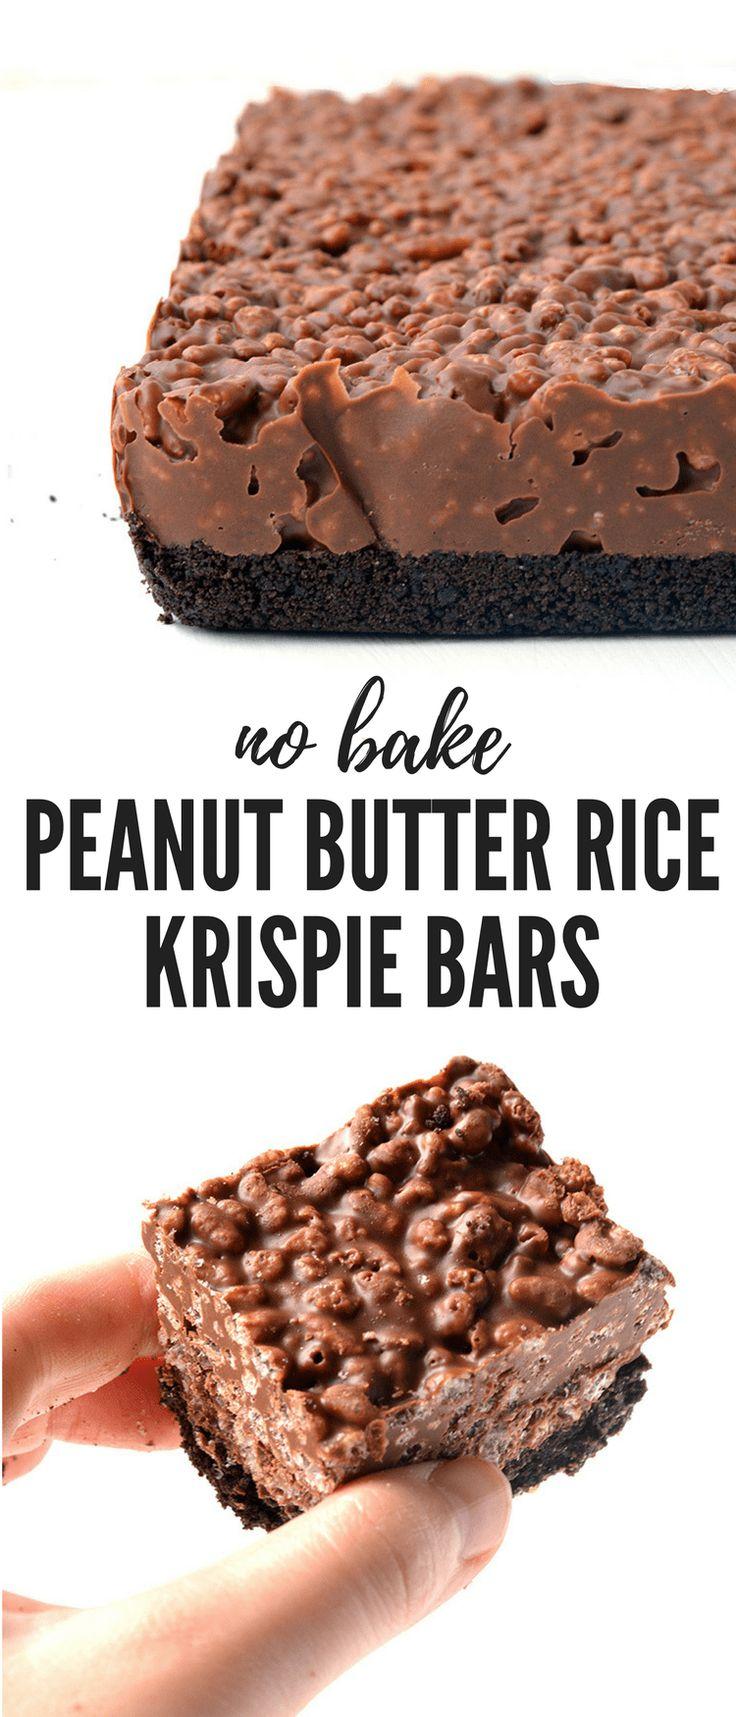 Peanut Butter Rice Krispie Bars